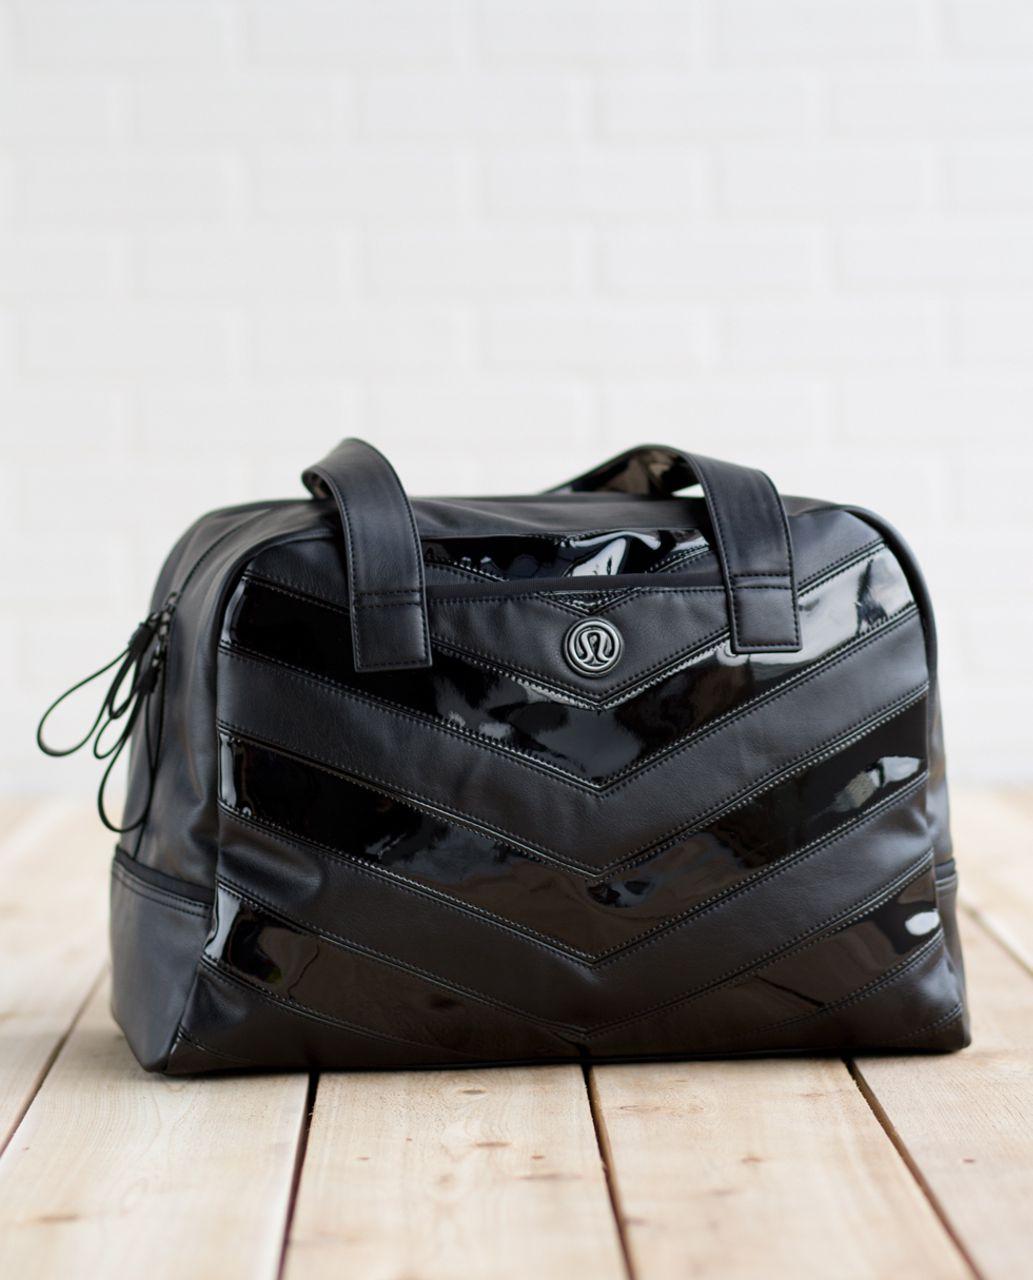 Lululemon Urban Sanctuary Bag *SE - Black